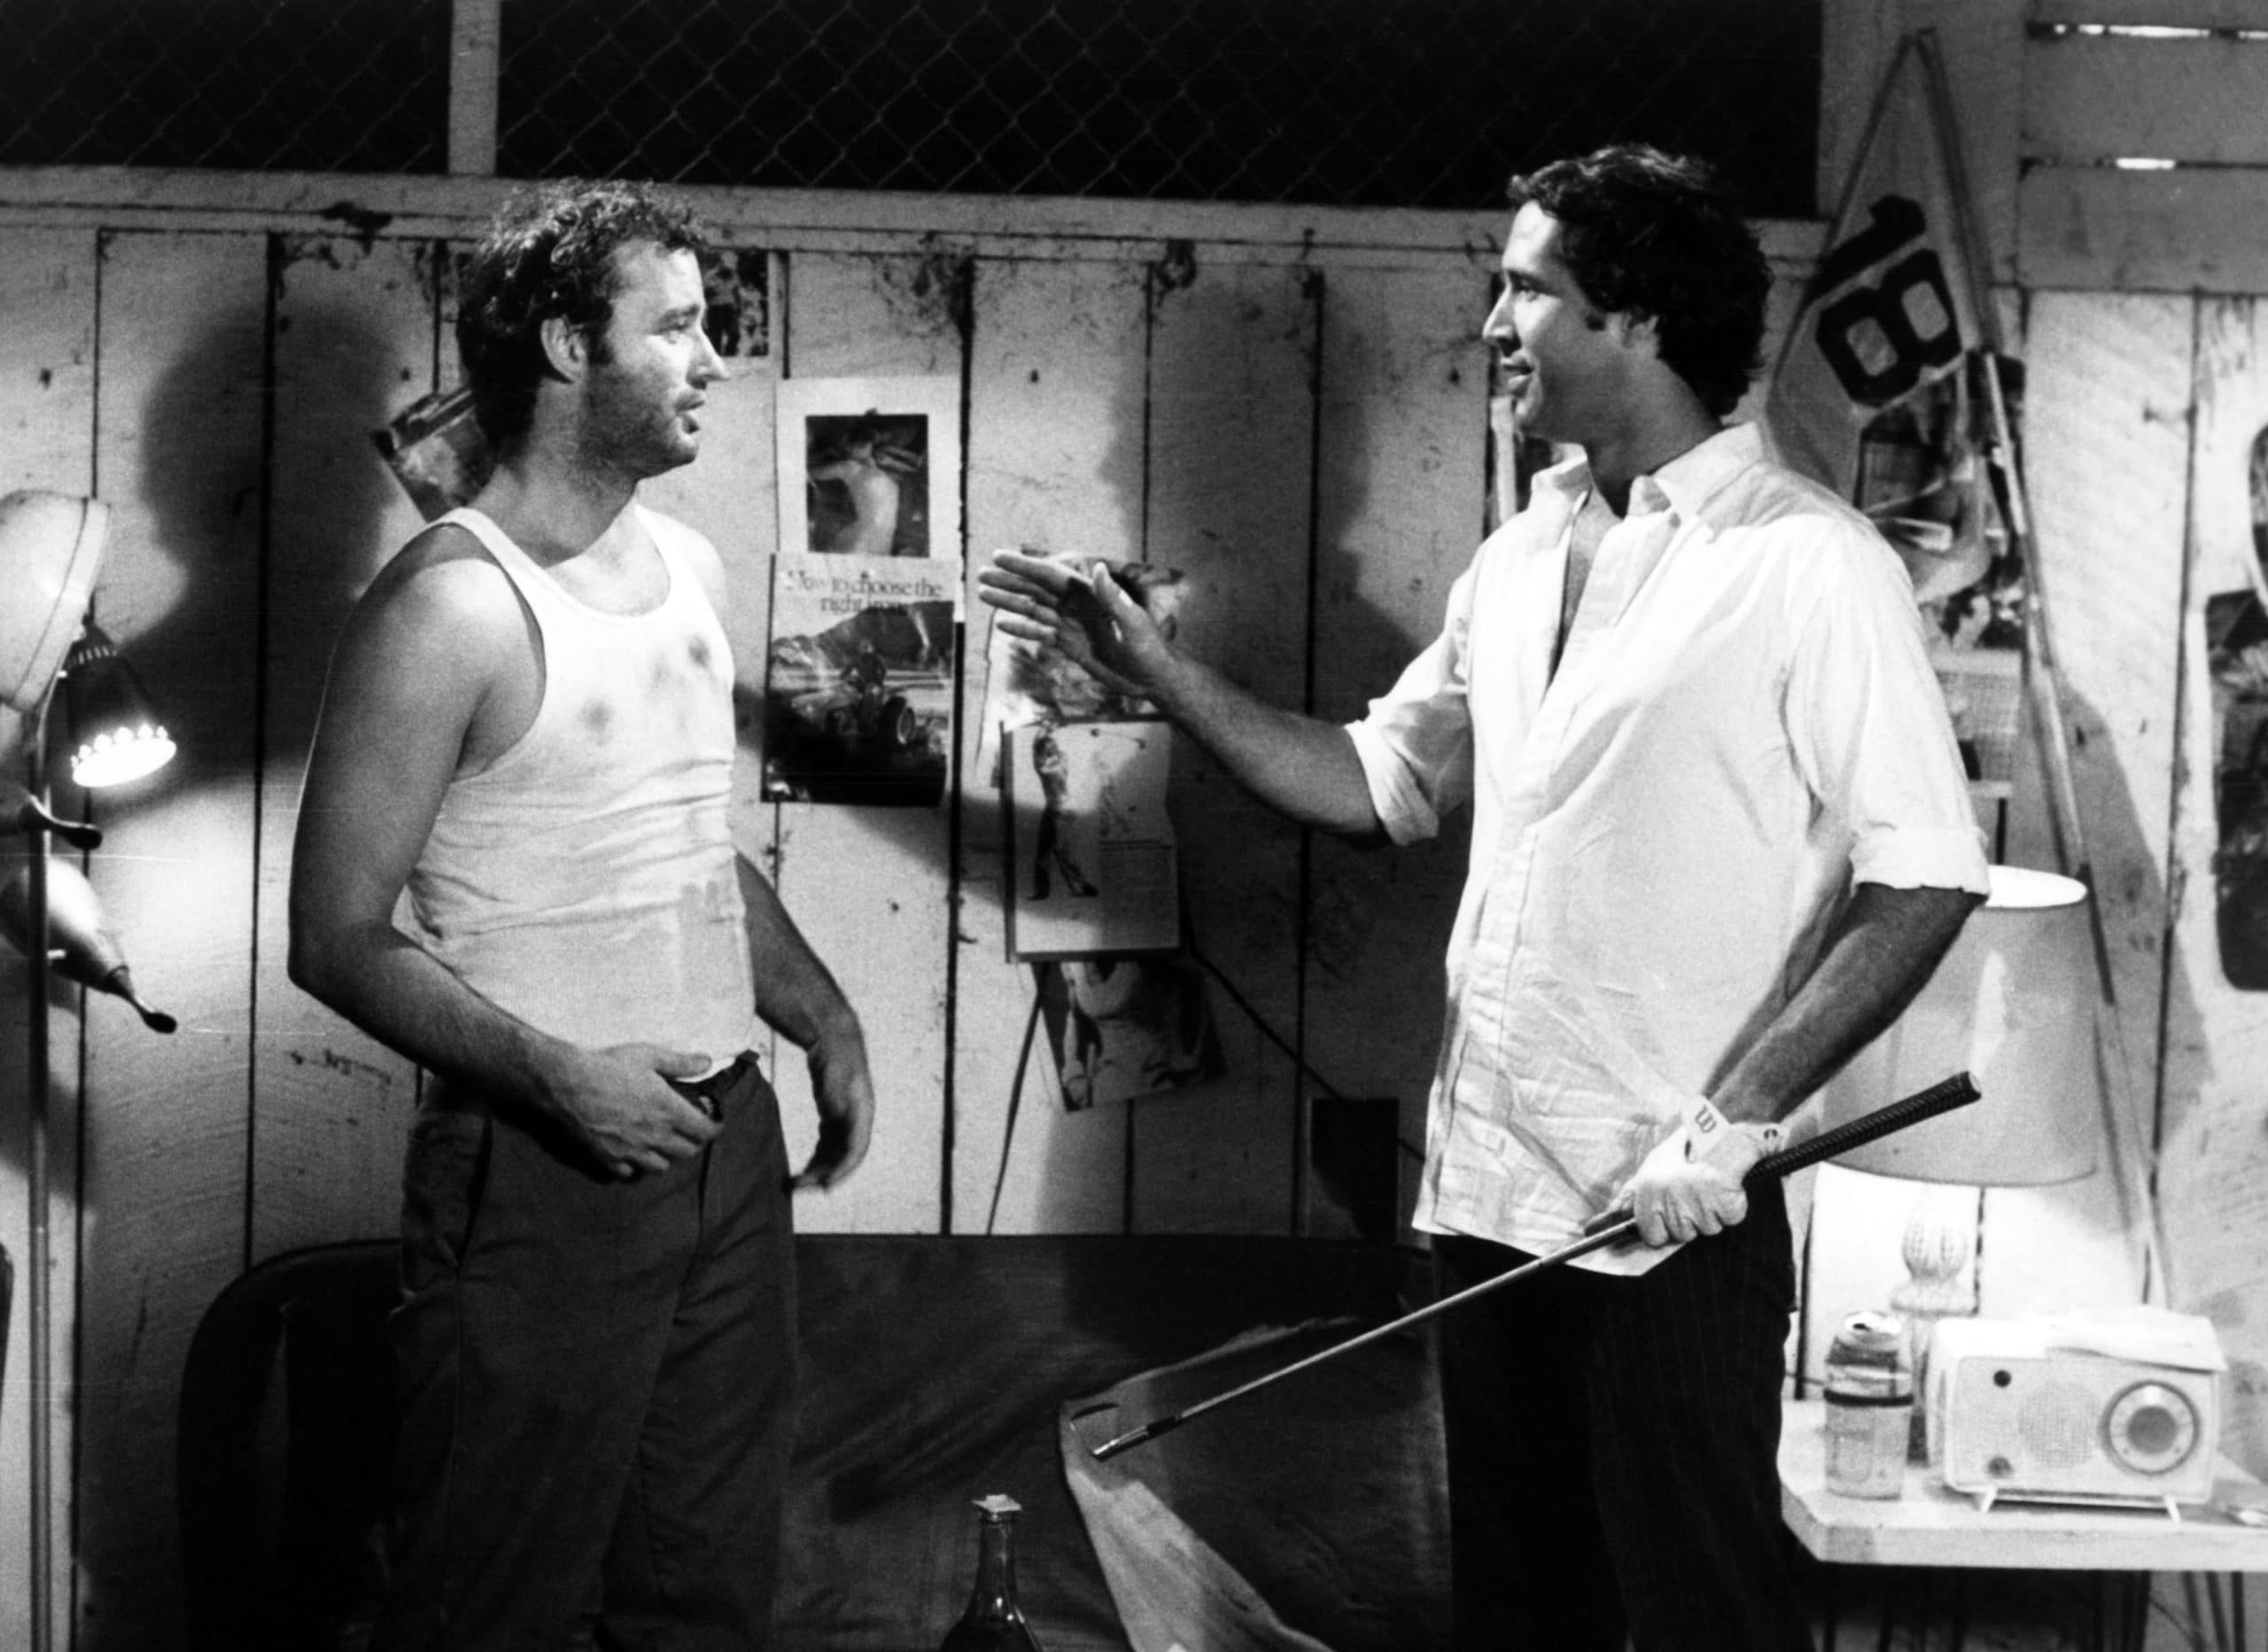 CADDYSHACK, Bill Murray, Chevy Chase, 1980